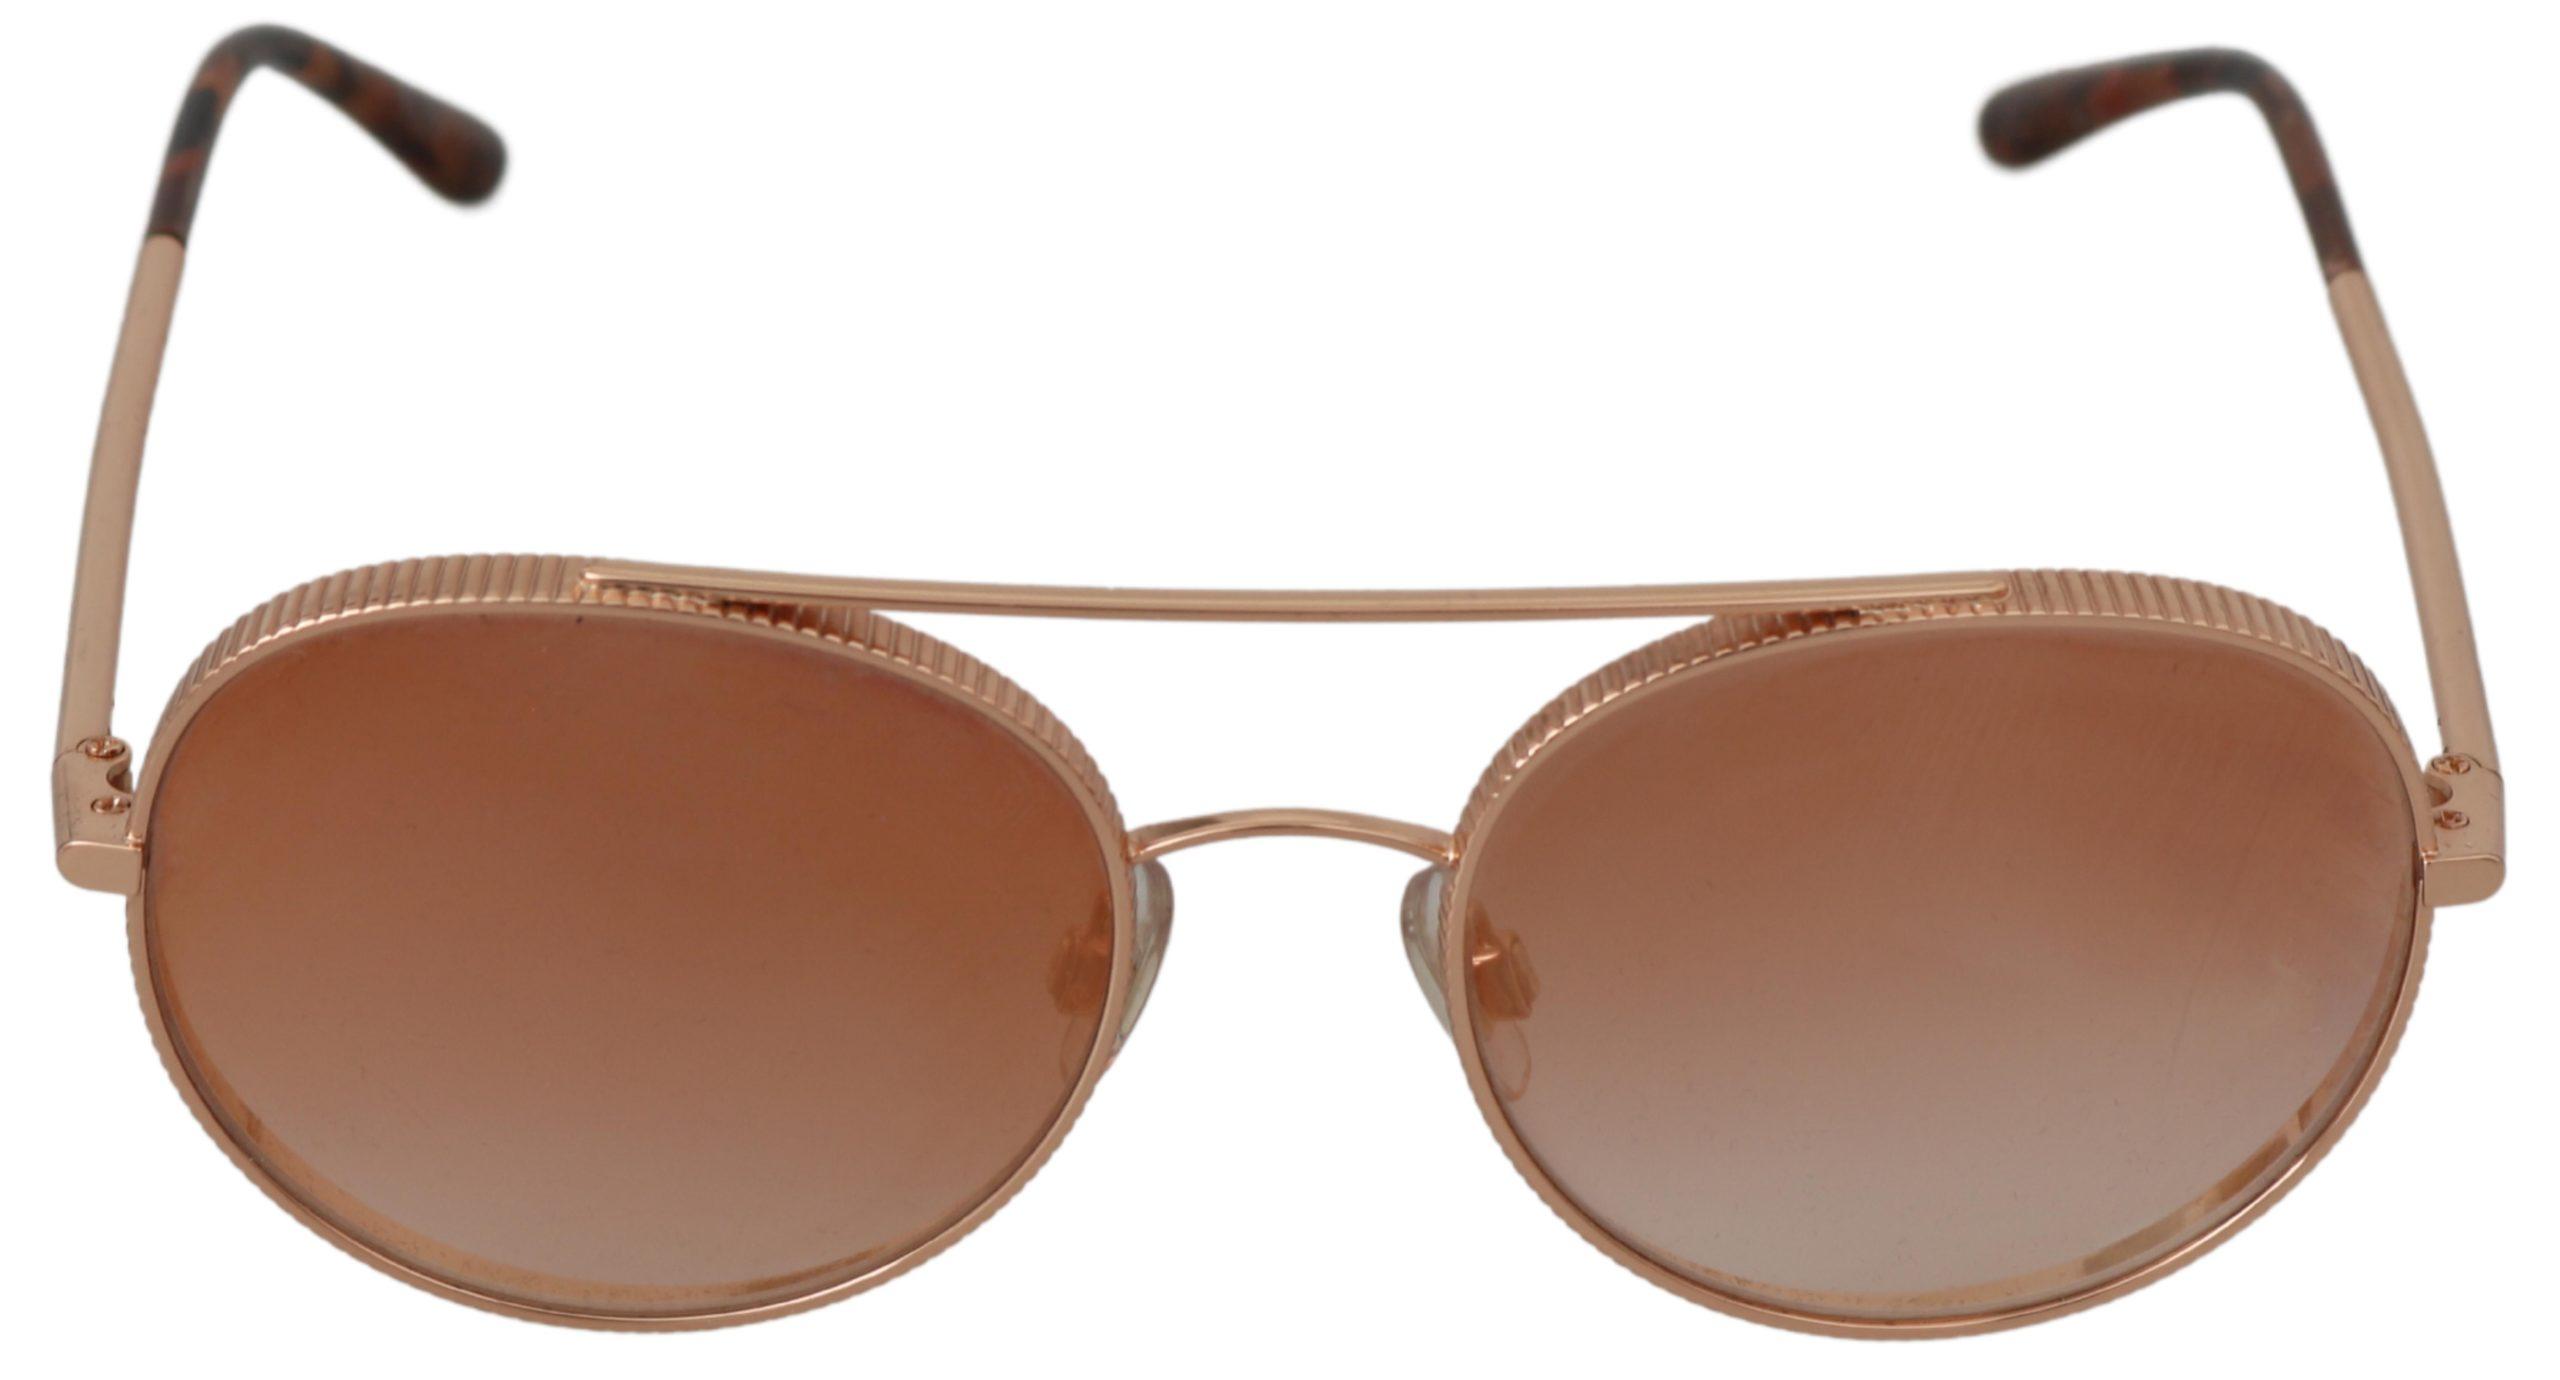 Dolce & Gabbana Women's Steel Gradient Pilot Sunglasses Gold GLA737